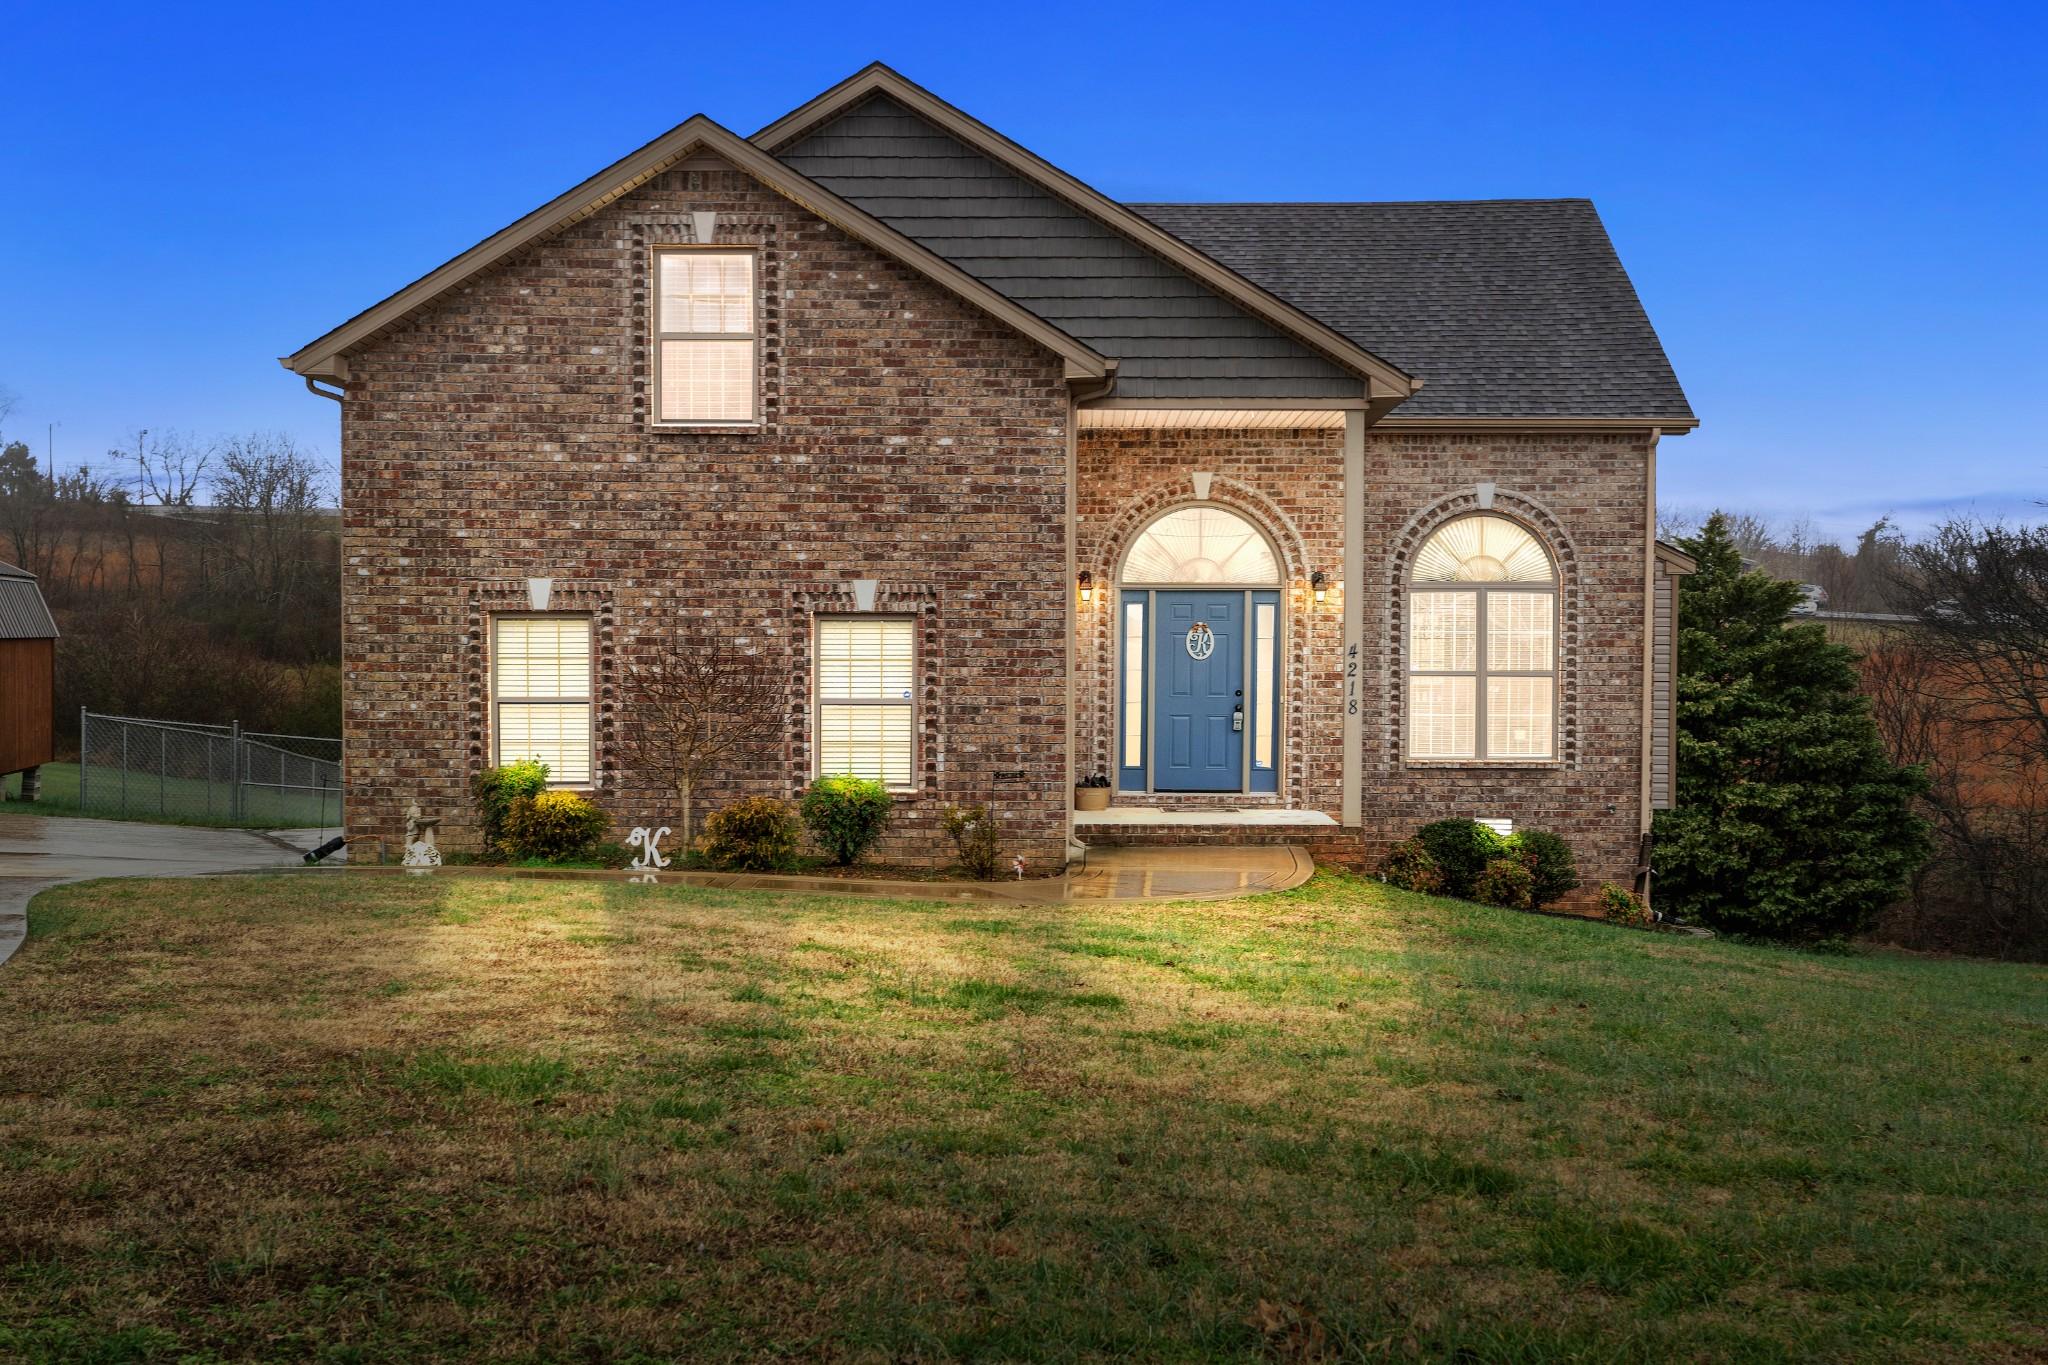 4218 Station Rd, Cunningham, TN 37052 - Cunningham, TN real estate listing